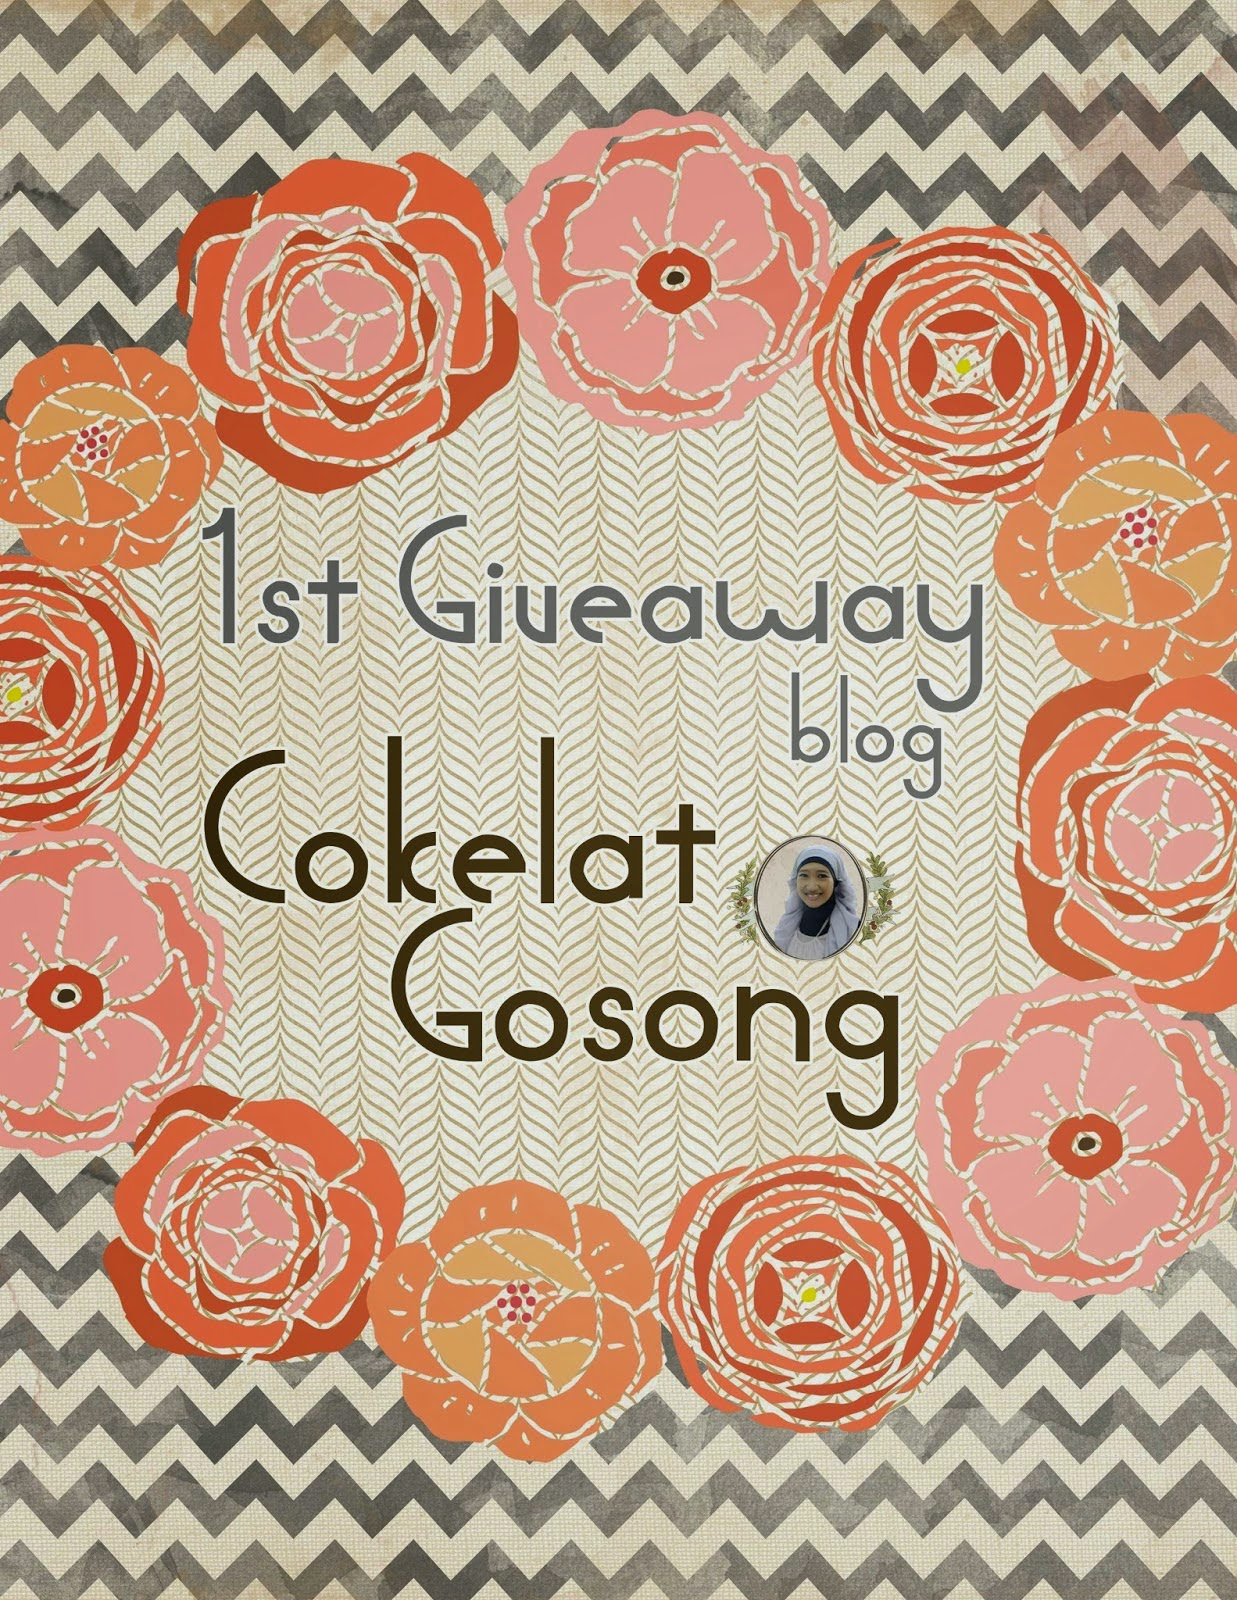 http://cokelatgosong.blogspot.com/2015/02/-giveaway-pertama-blog-cokelat-gosong.html